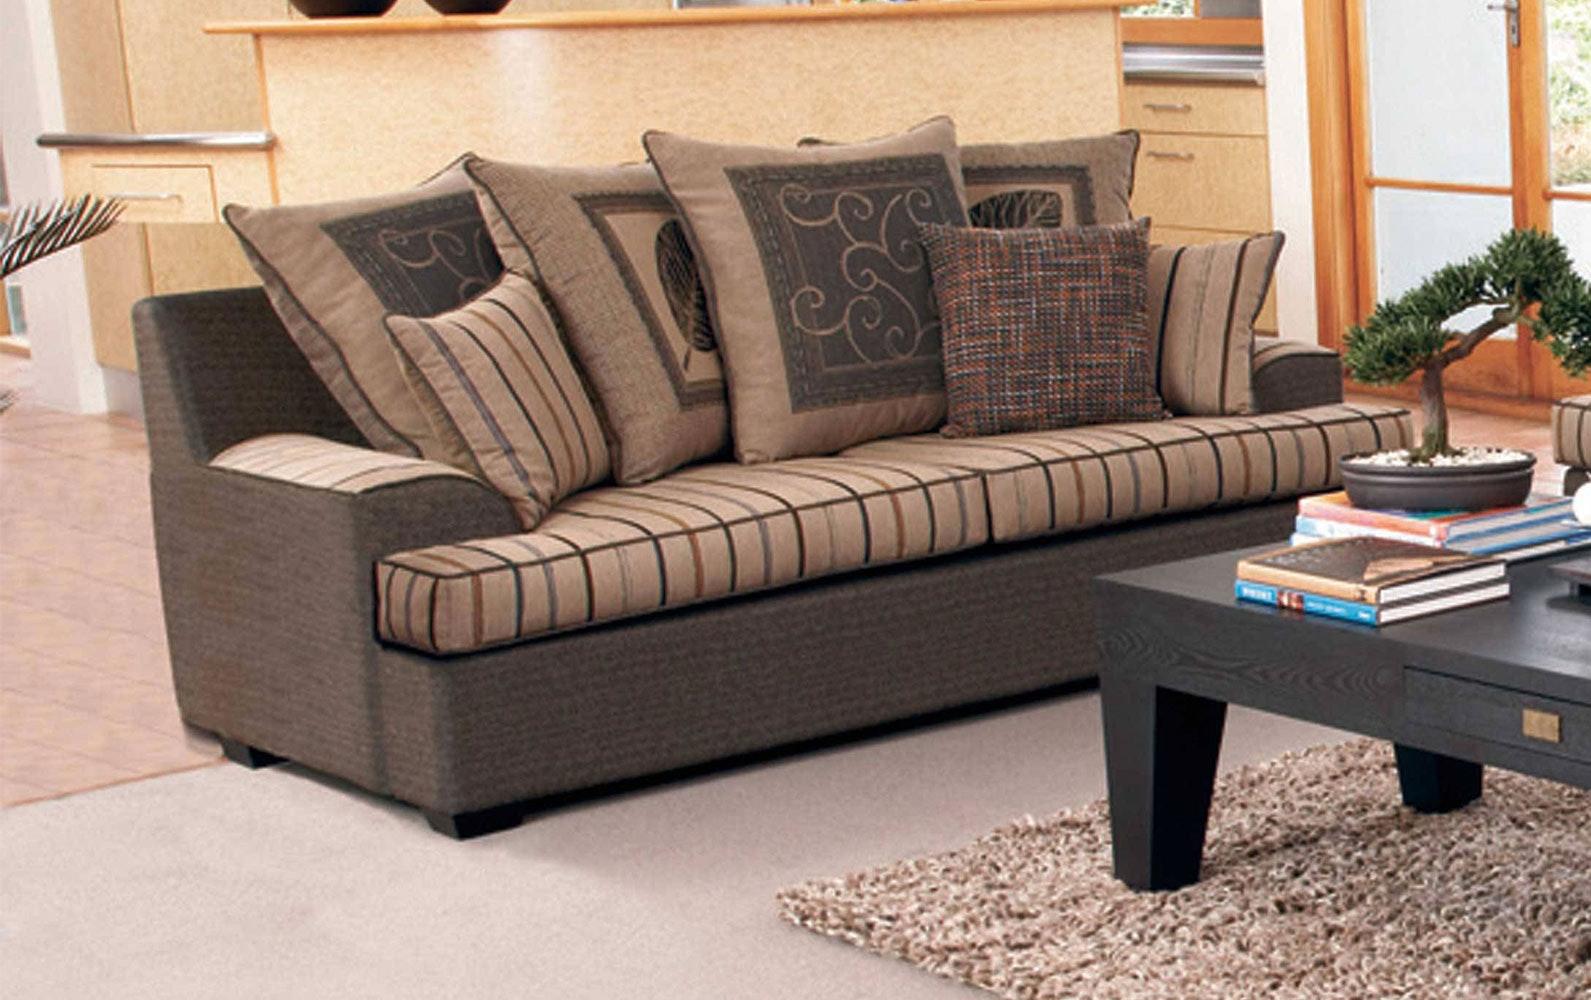 Key West 2 Seat Sofa   Fabric   Furniture Haven